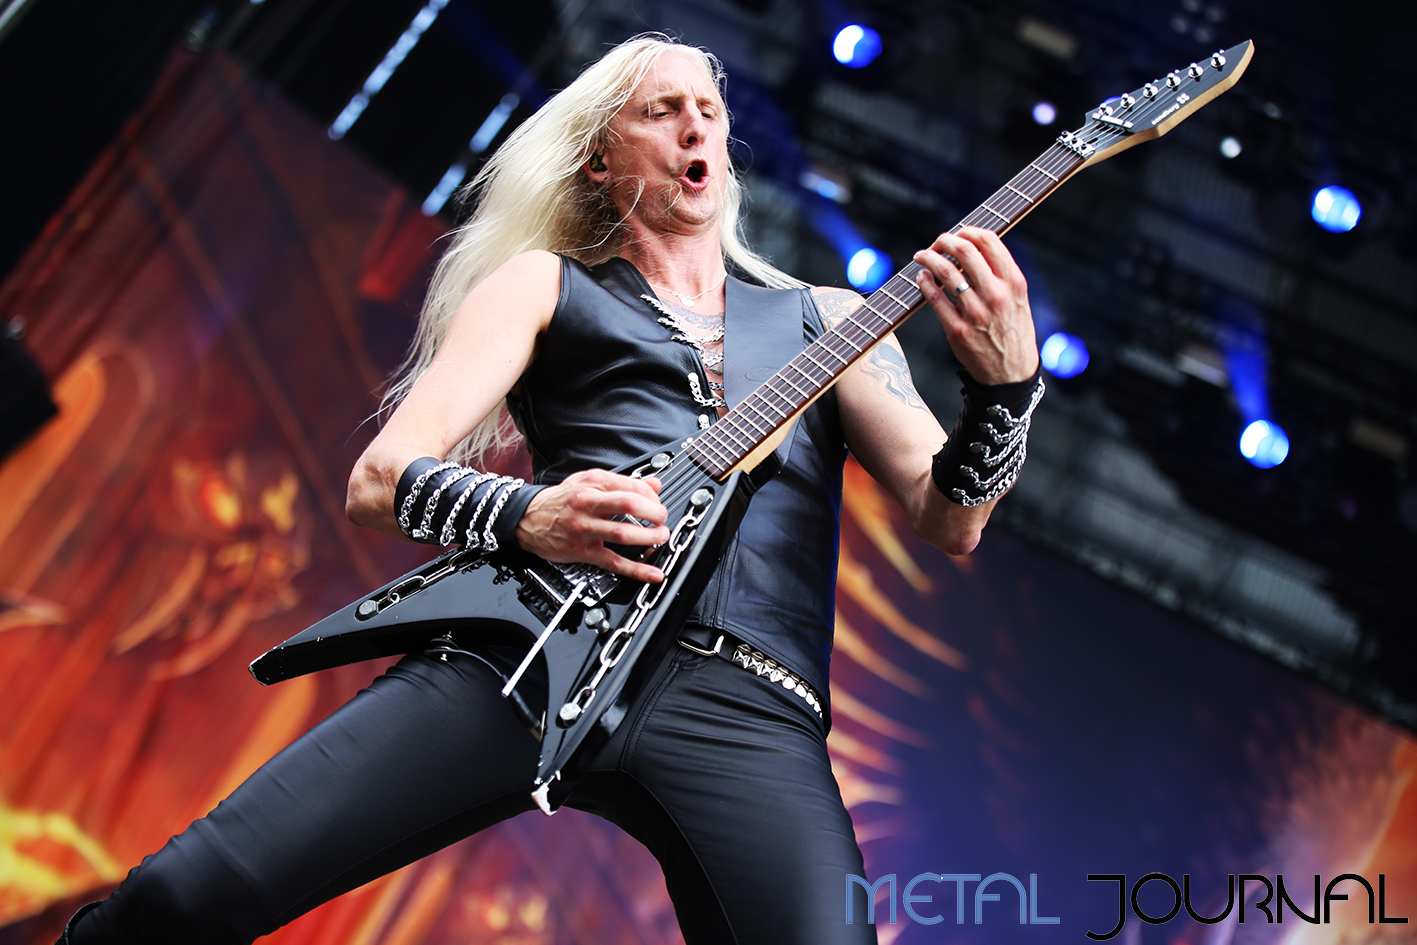 hammerfall - metal journal rock fest barcelona 2019 pic 2